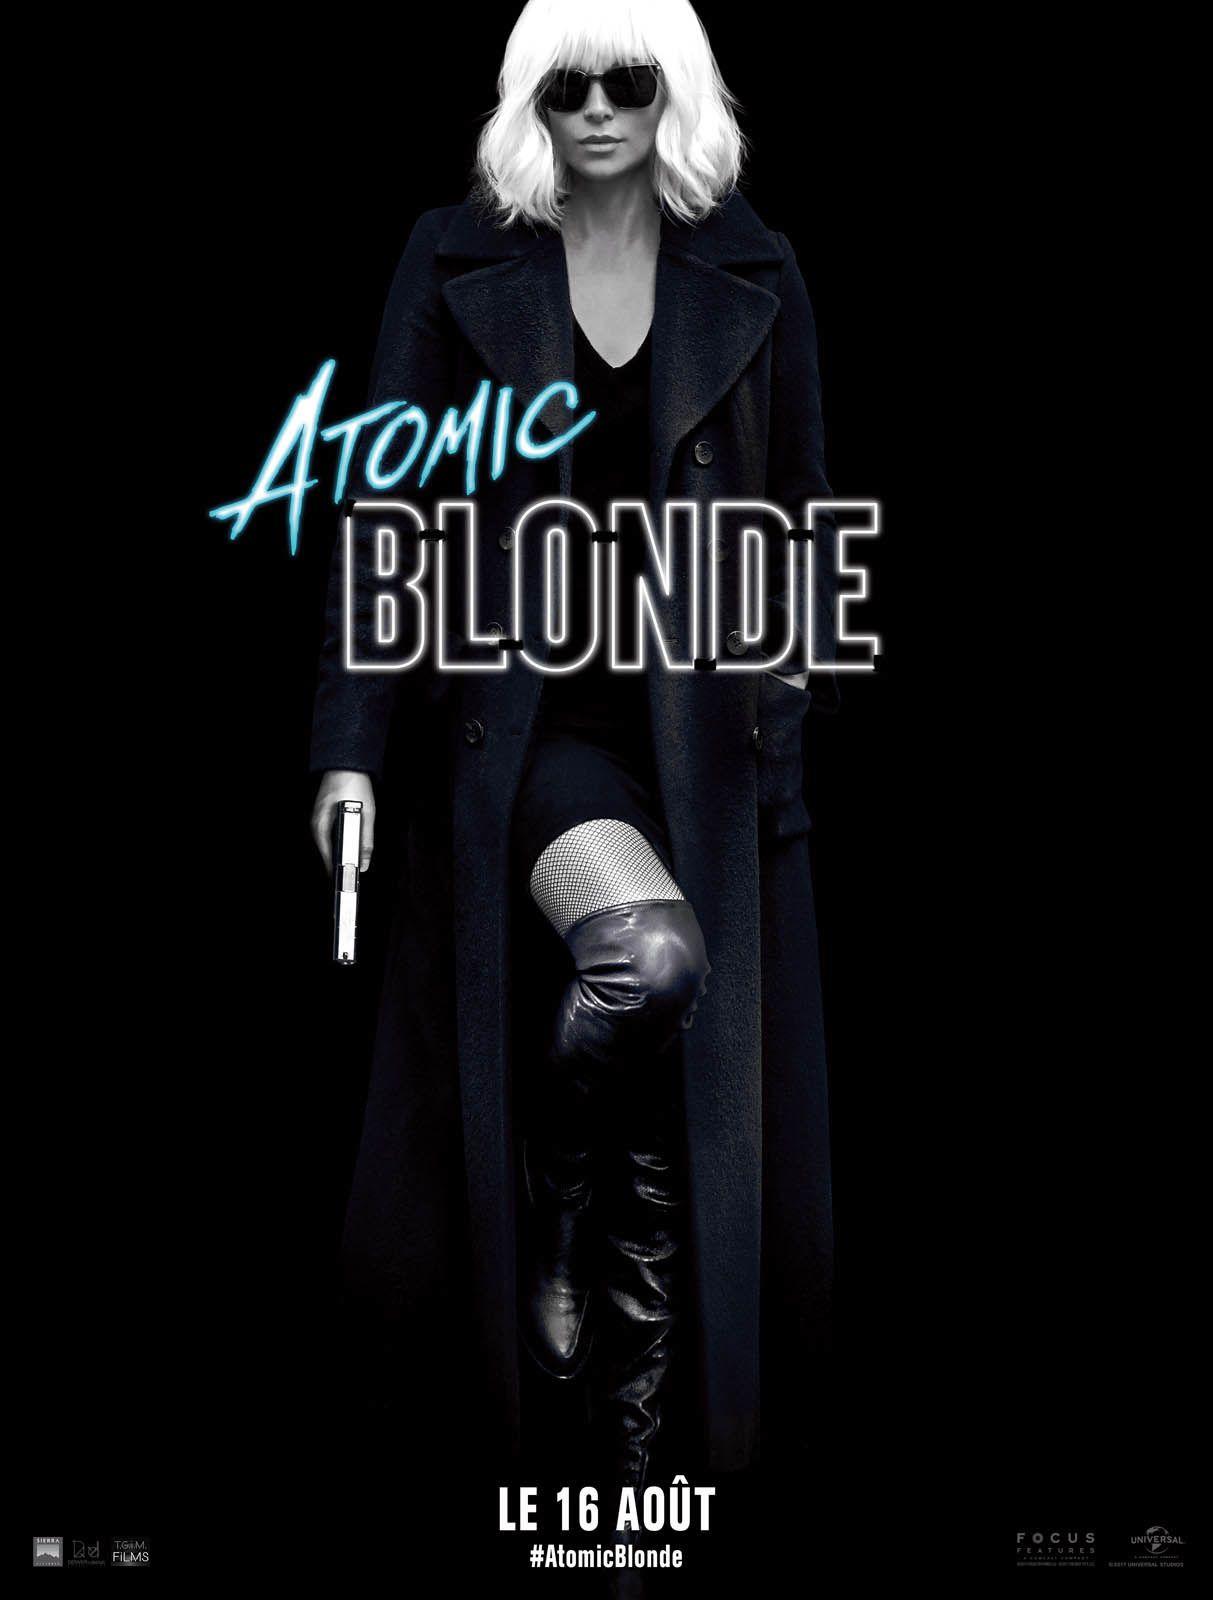 Dans les salles ce mercredi : Atomic Blonde.